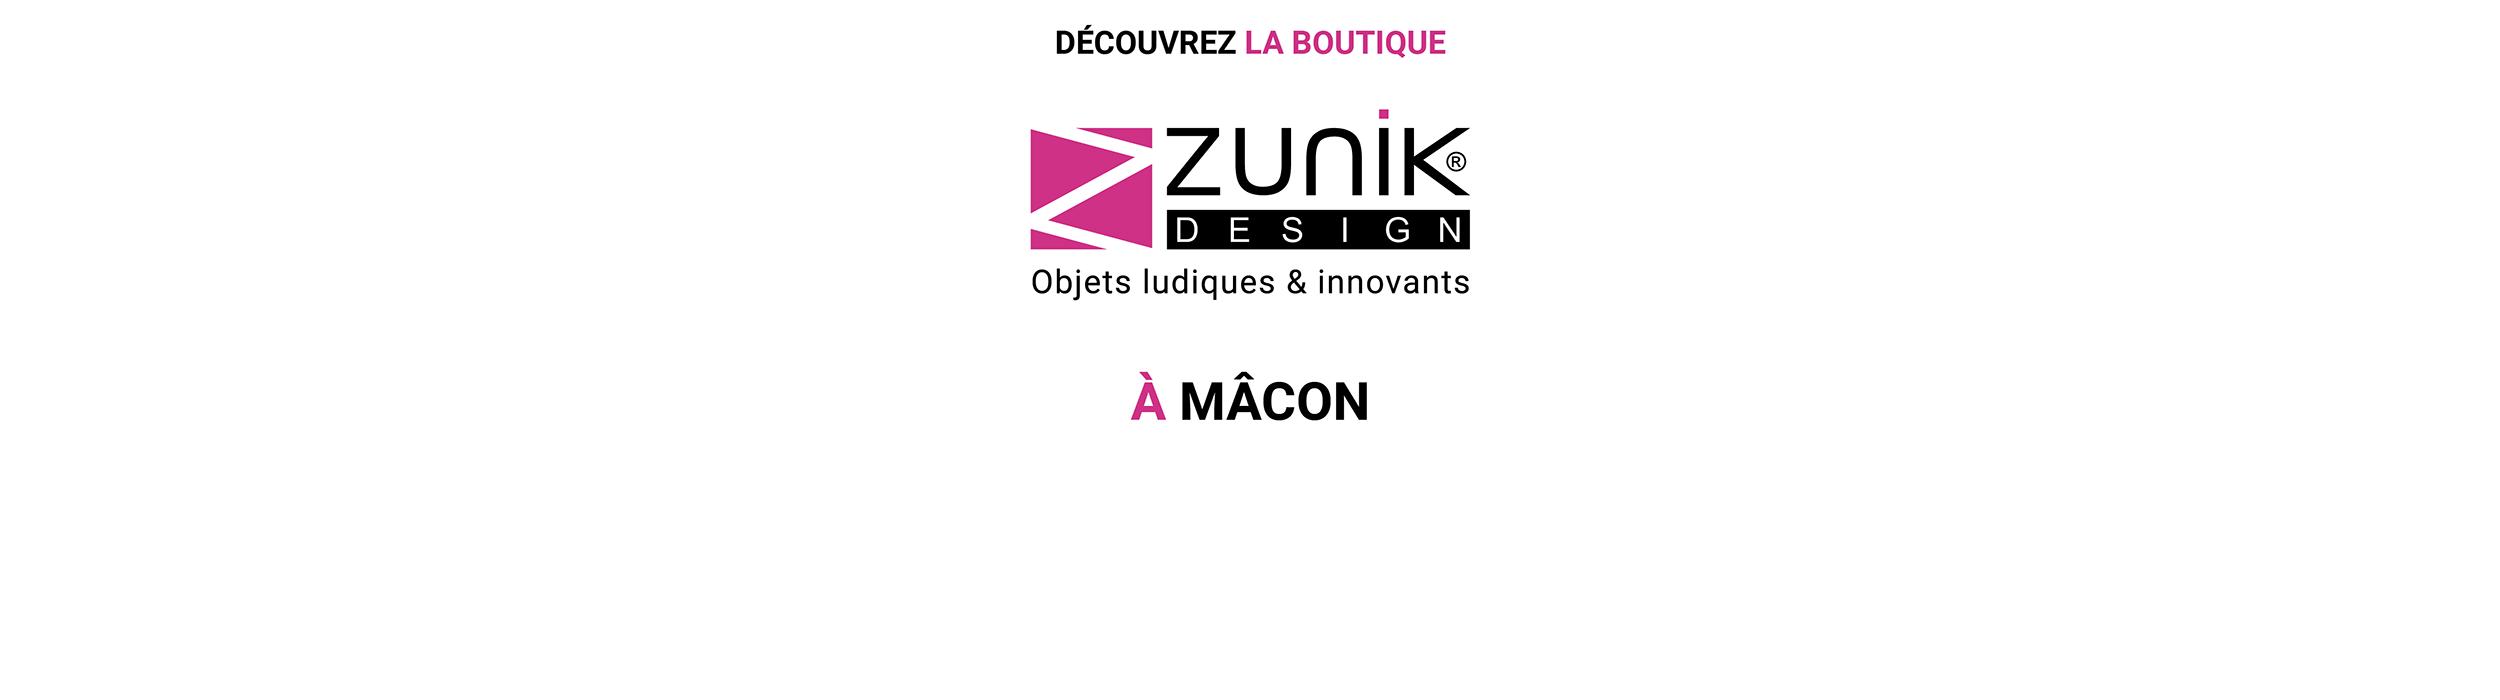 Zunik Mâcon